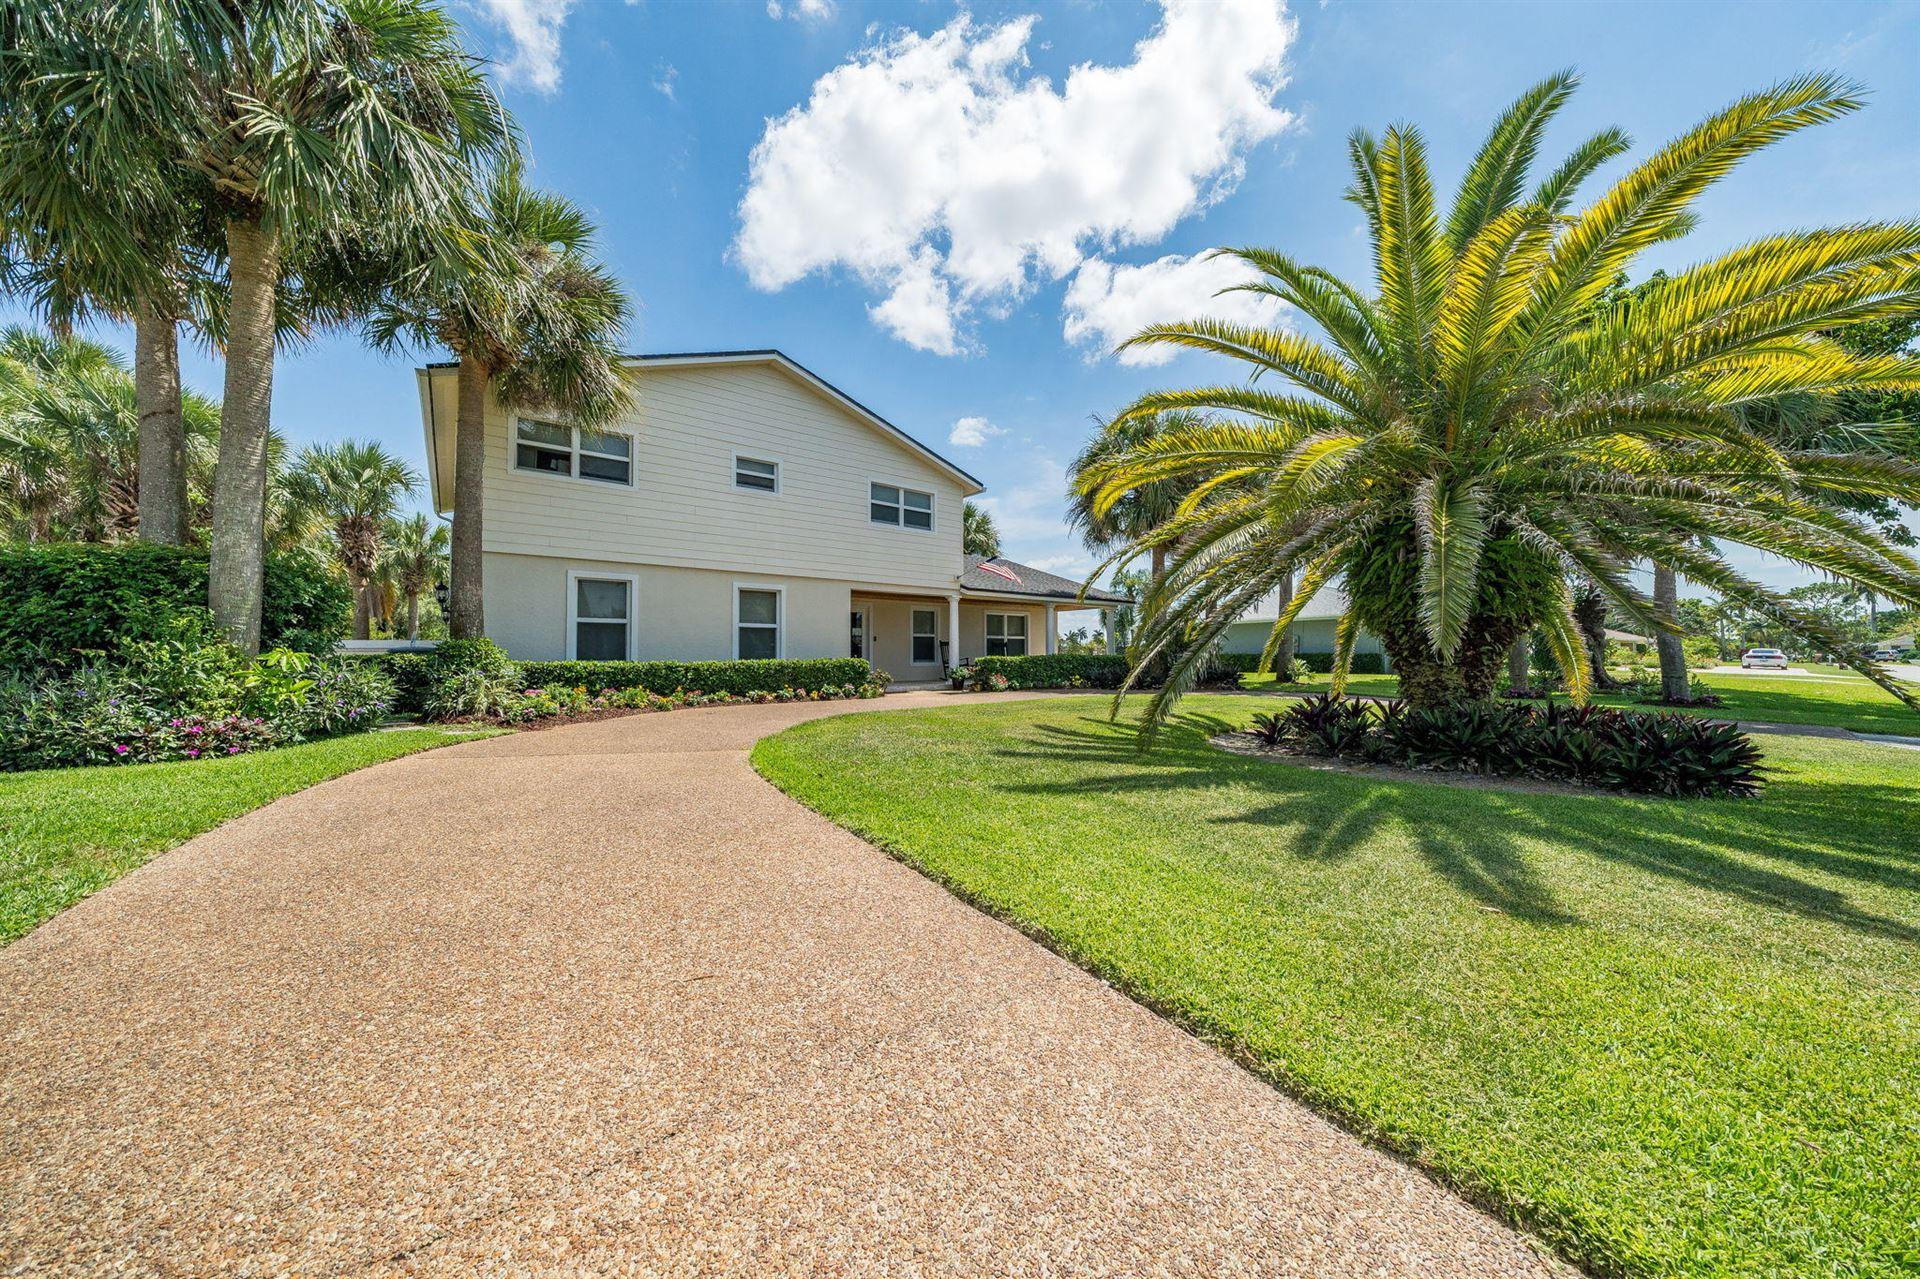 4466 Palo Verde Drive, Boynton Beach, FL 33436 - MLS#: RX-10716575